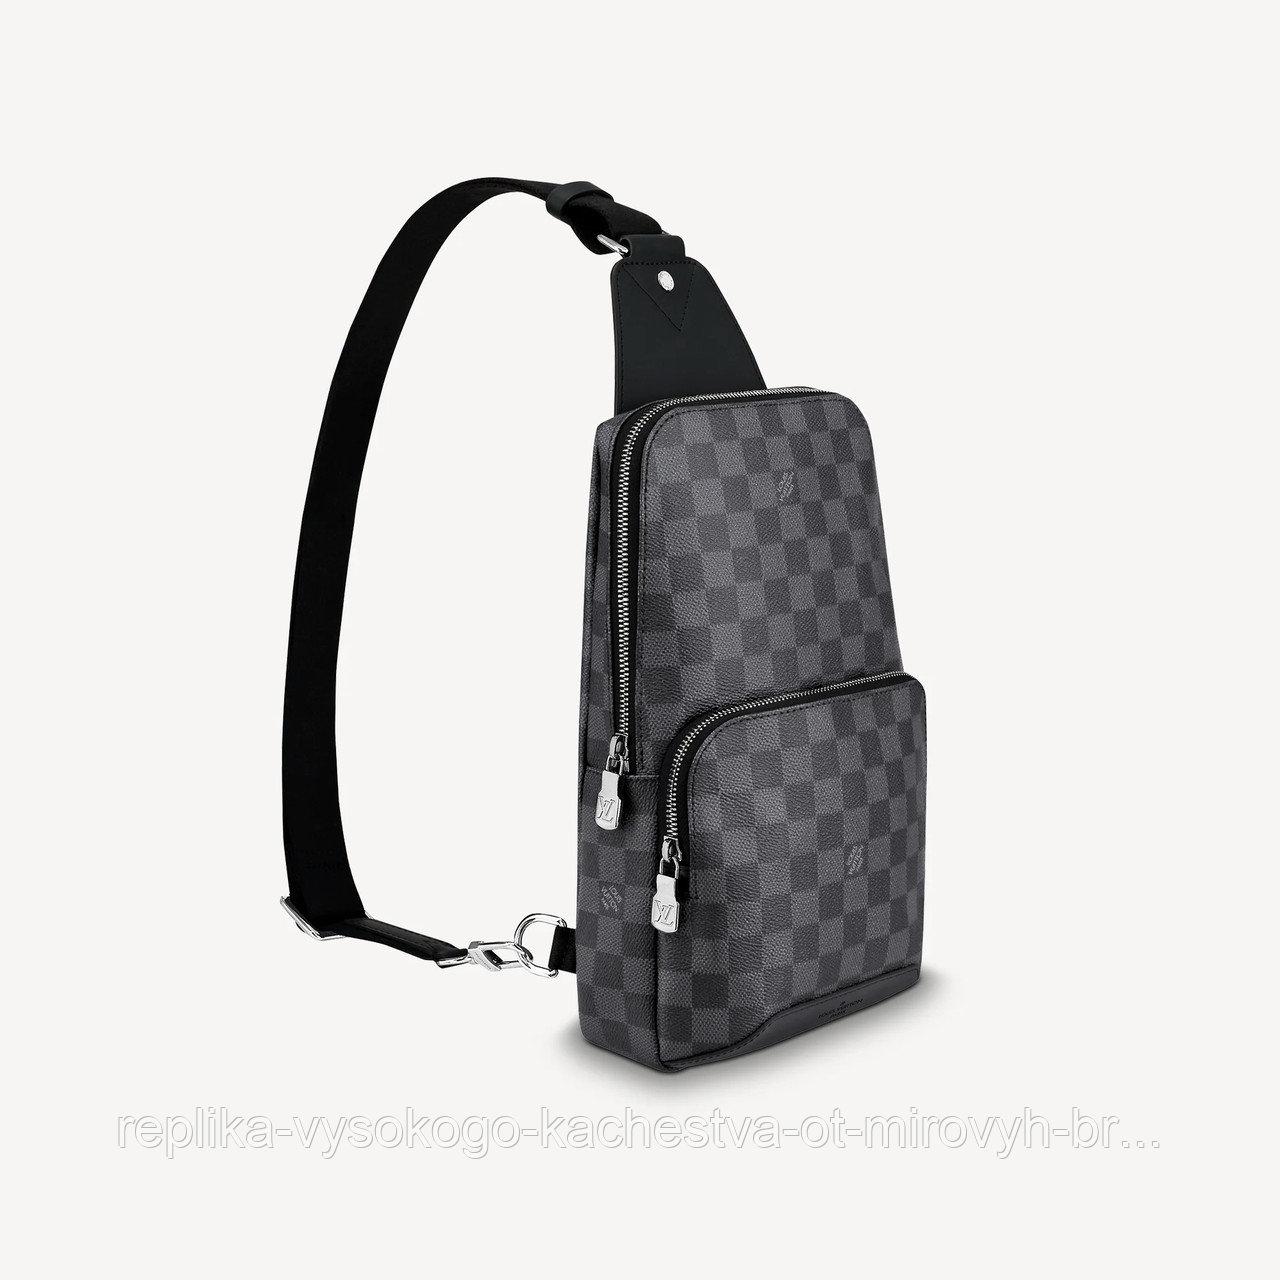 Сумка-мессенджер Avenue Sling Bag 2021